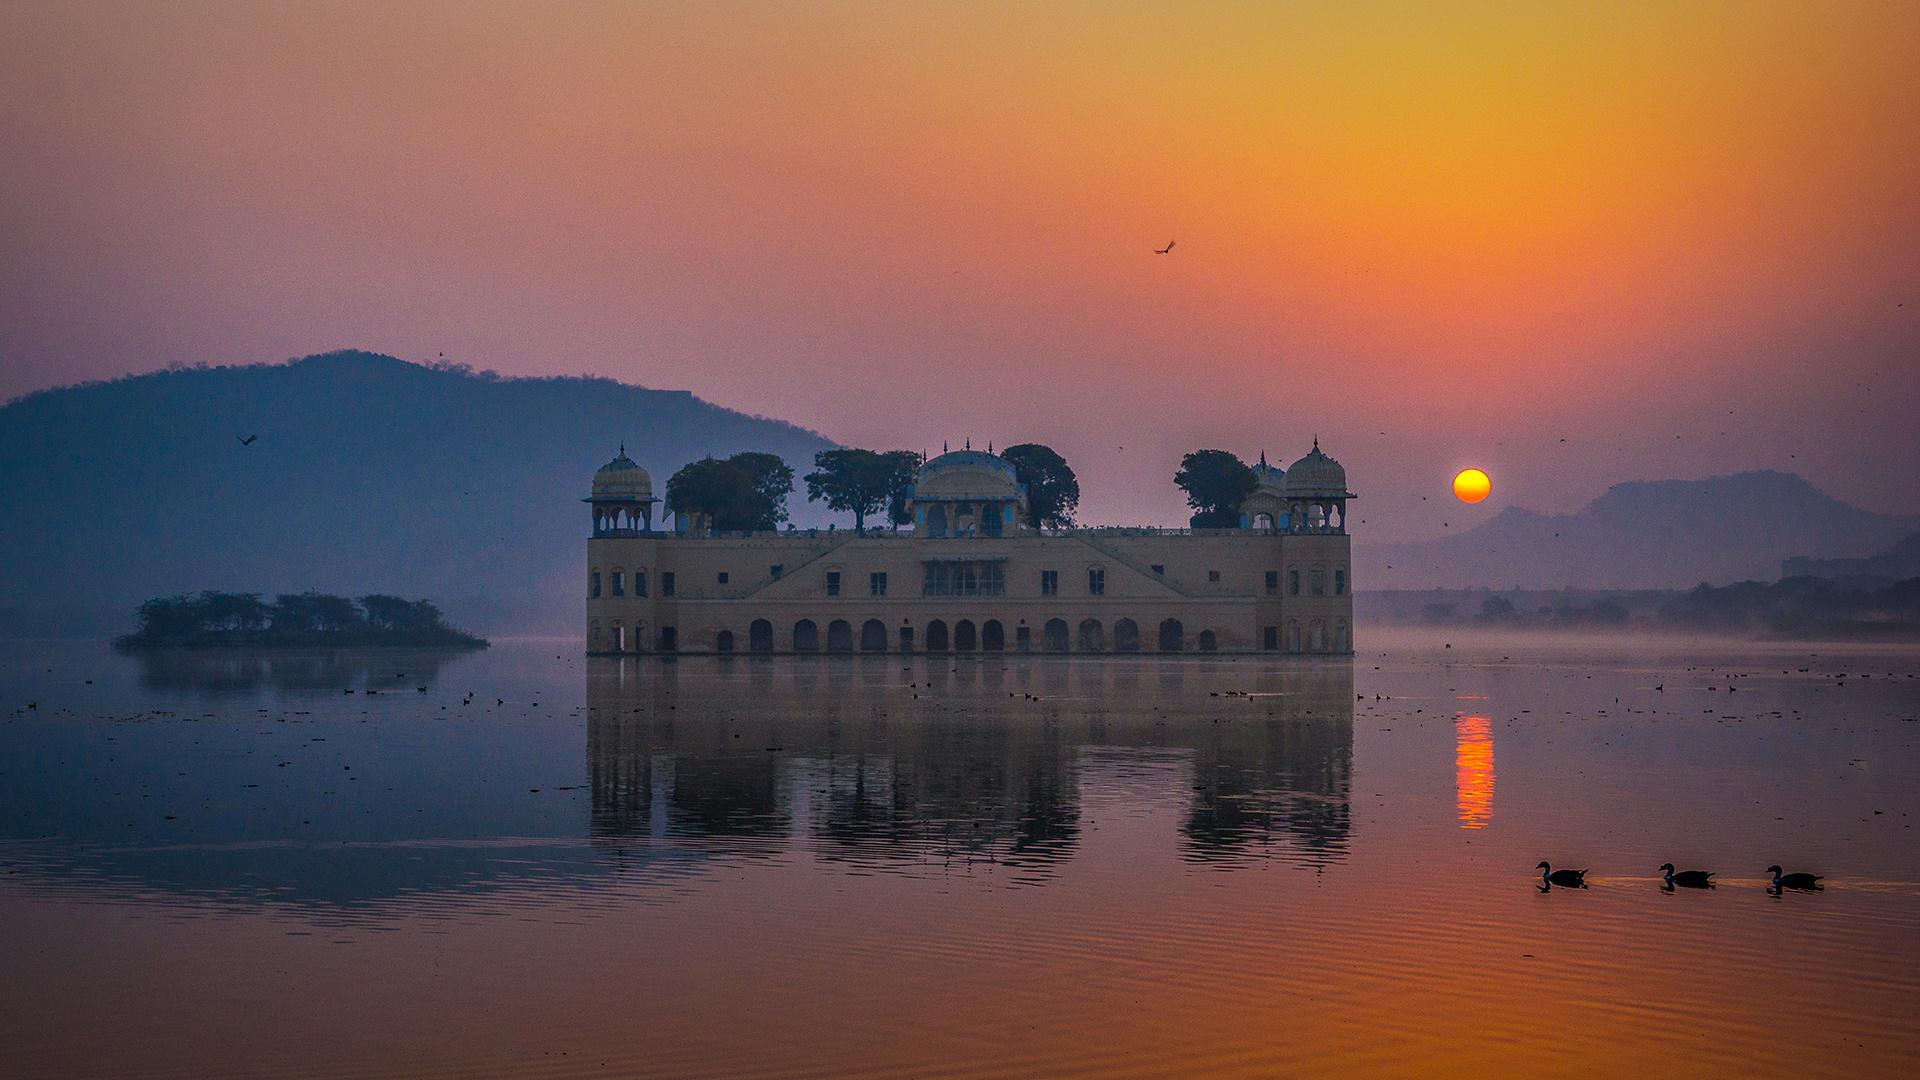 Sunrise at Jal Mahal